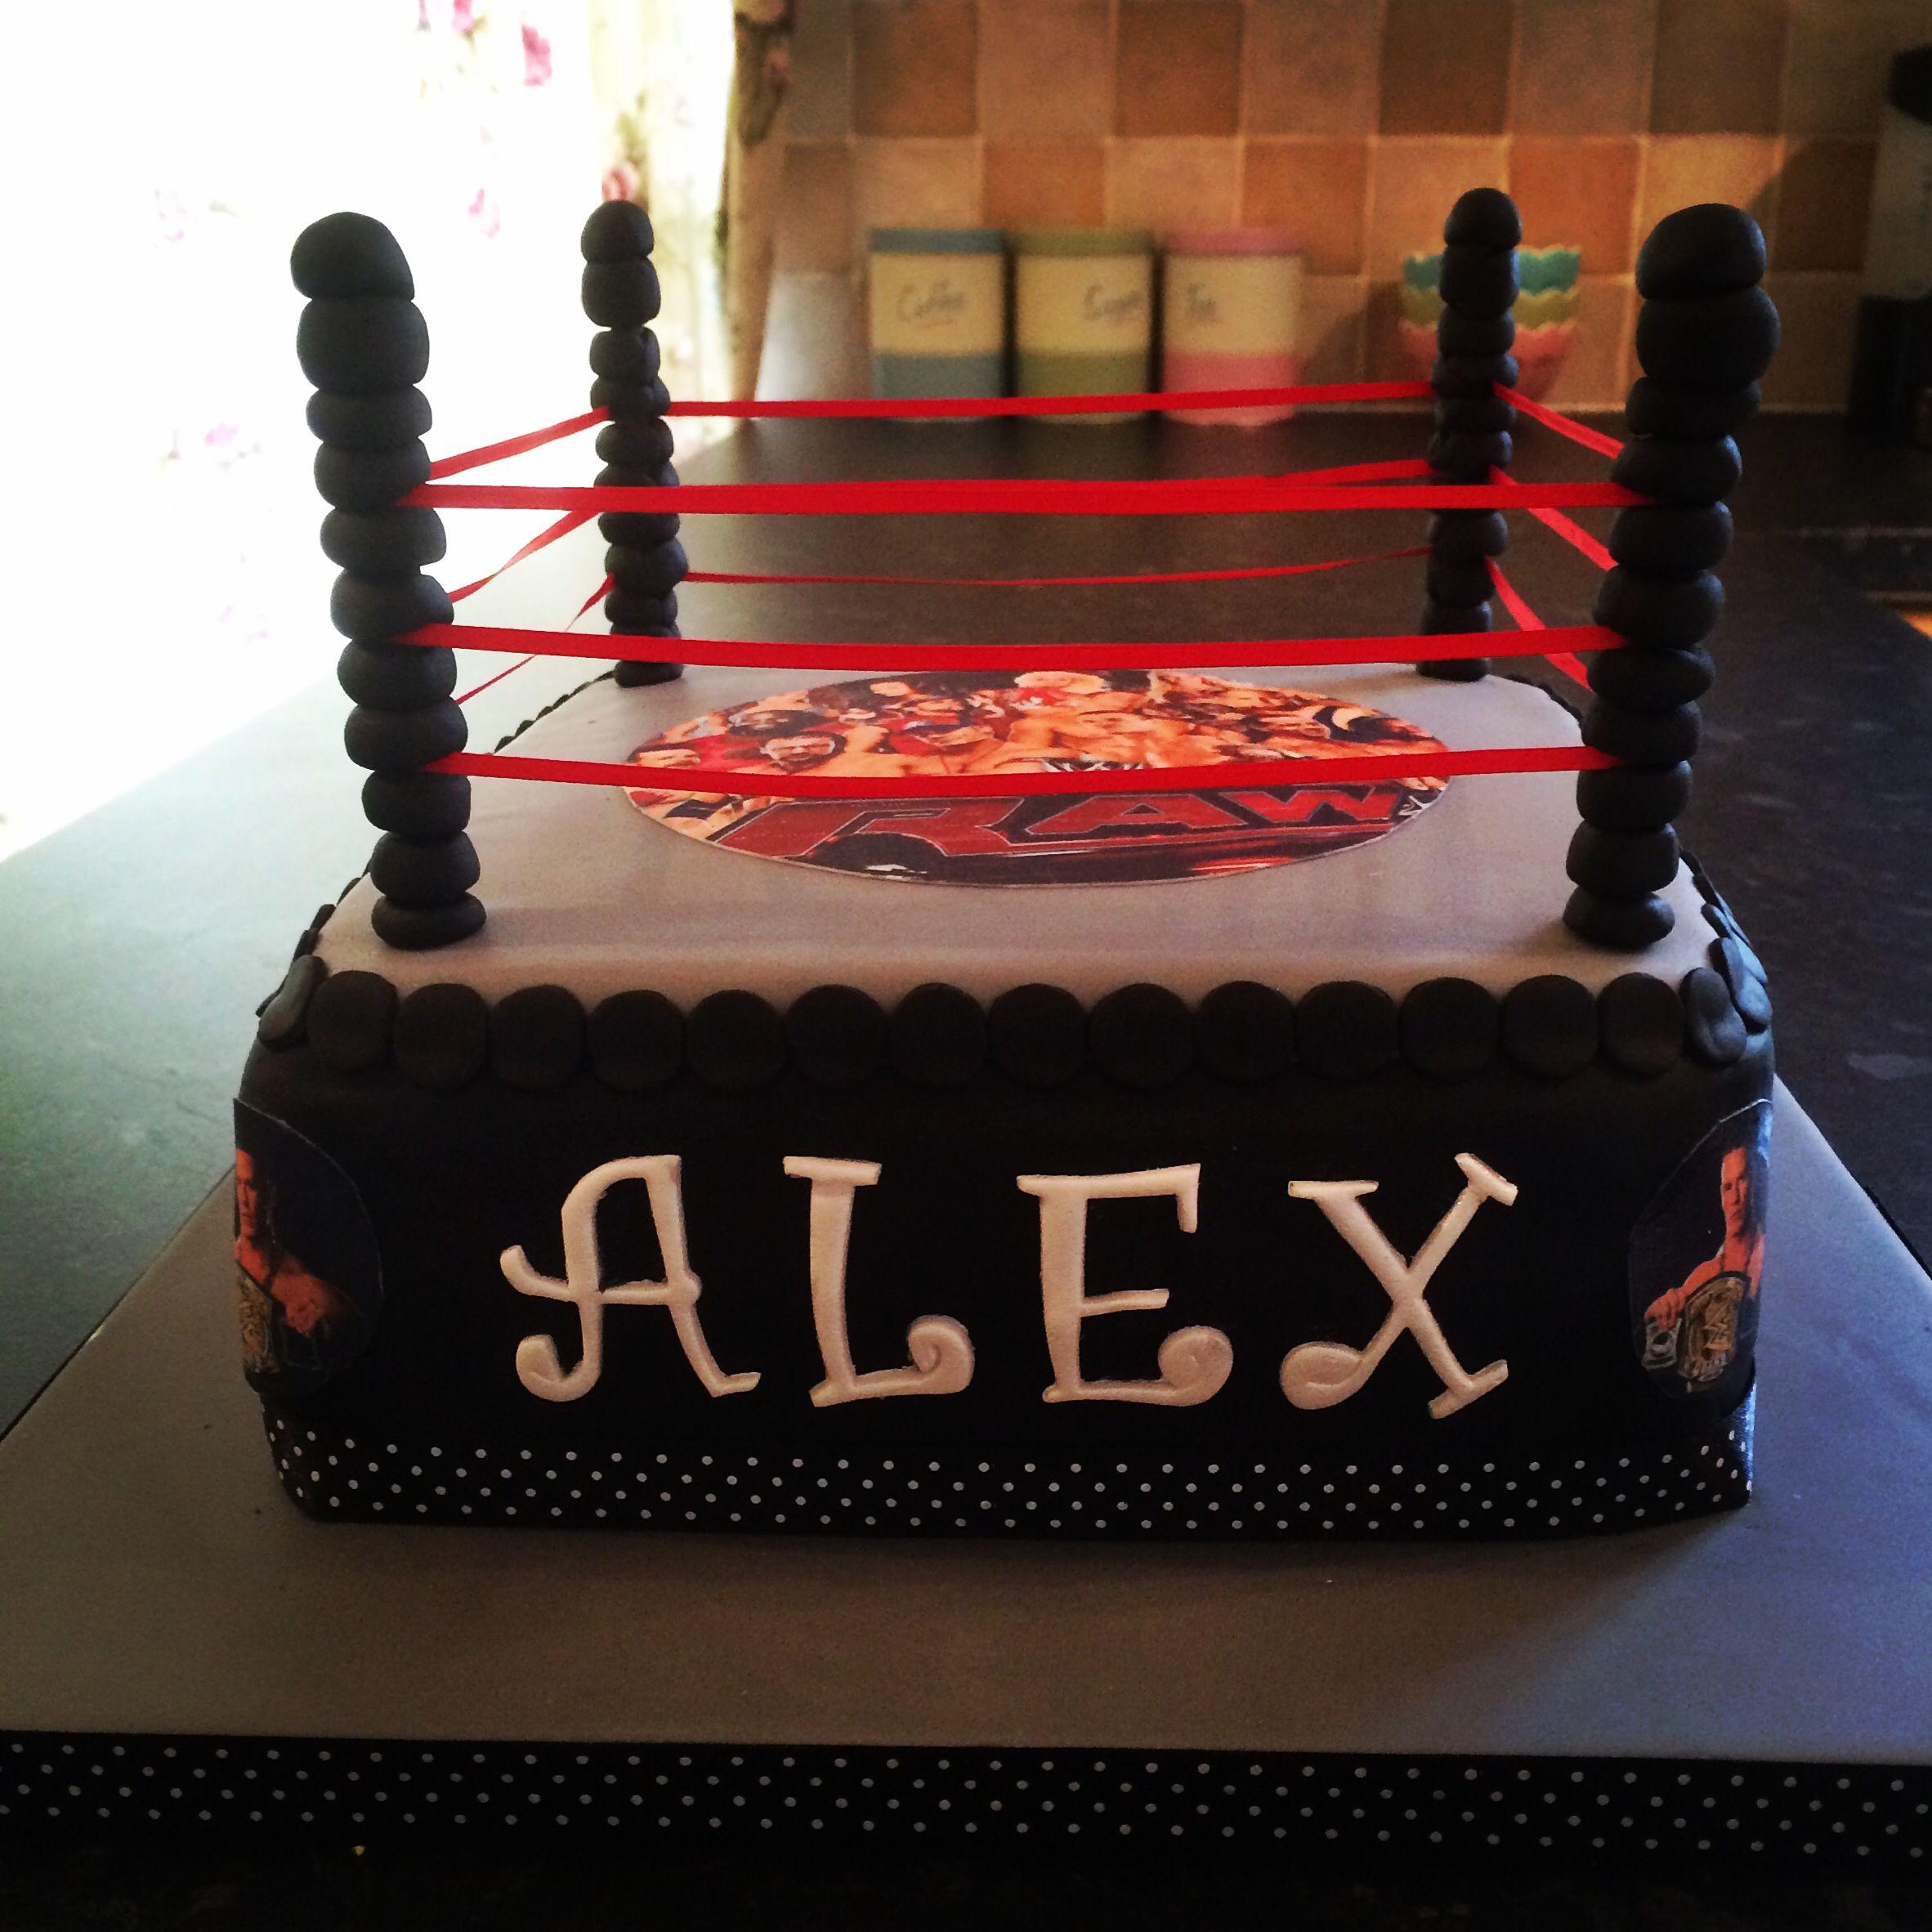 Wwe birthday cake wrestling cake wwe birthday cakes